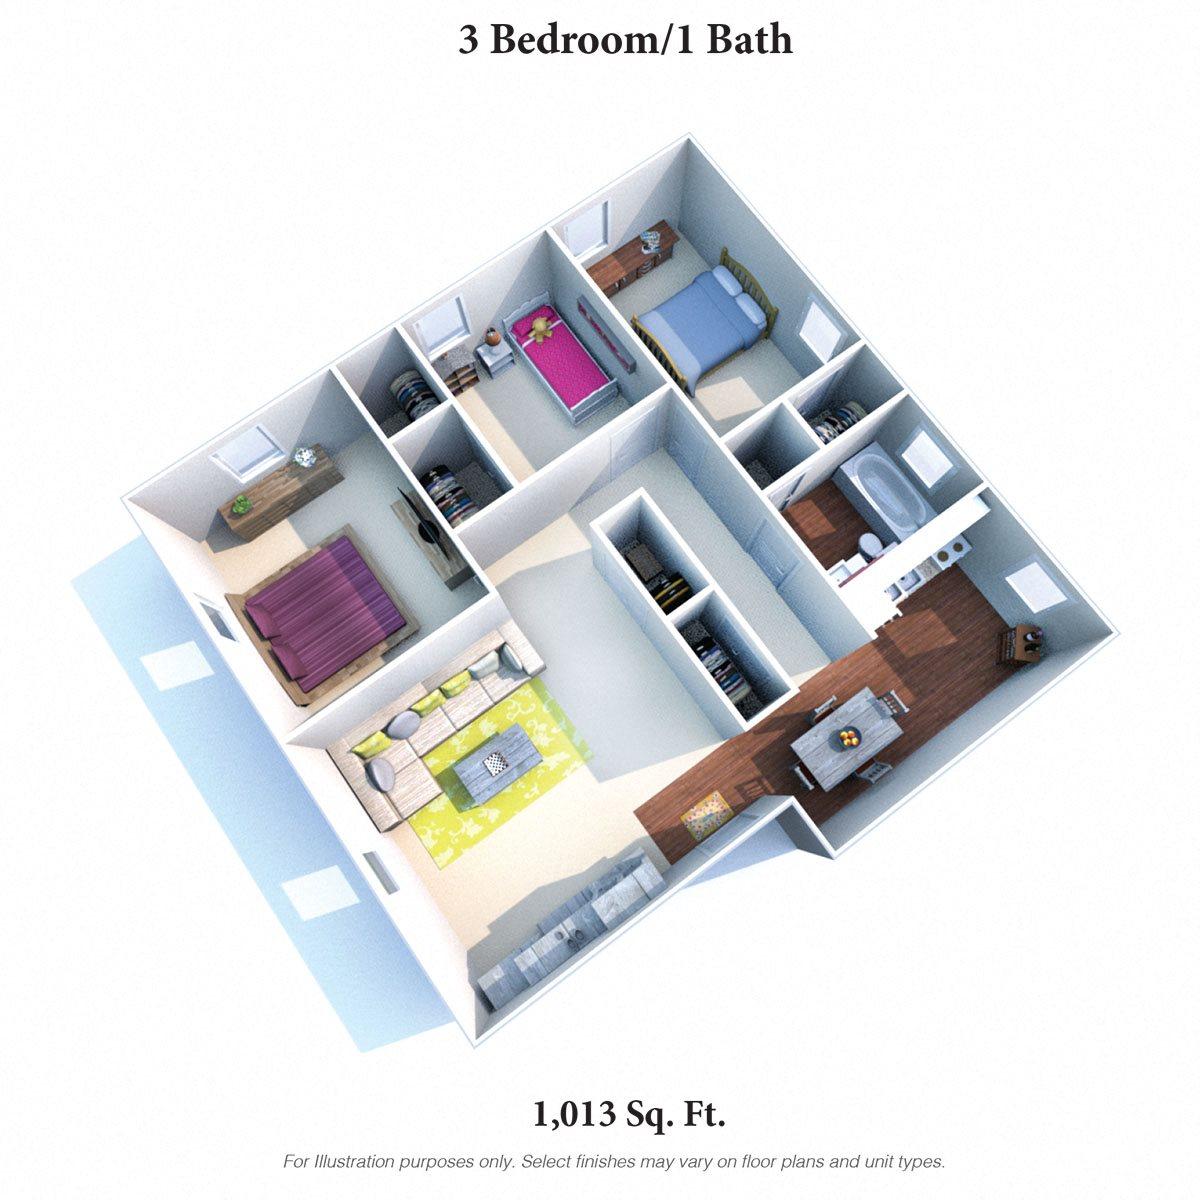 Willow Glen Apartments: Willow Glen Apartments EBrochure